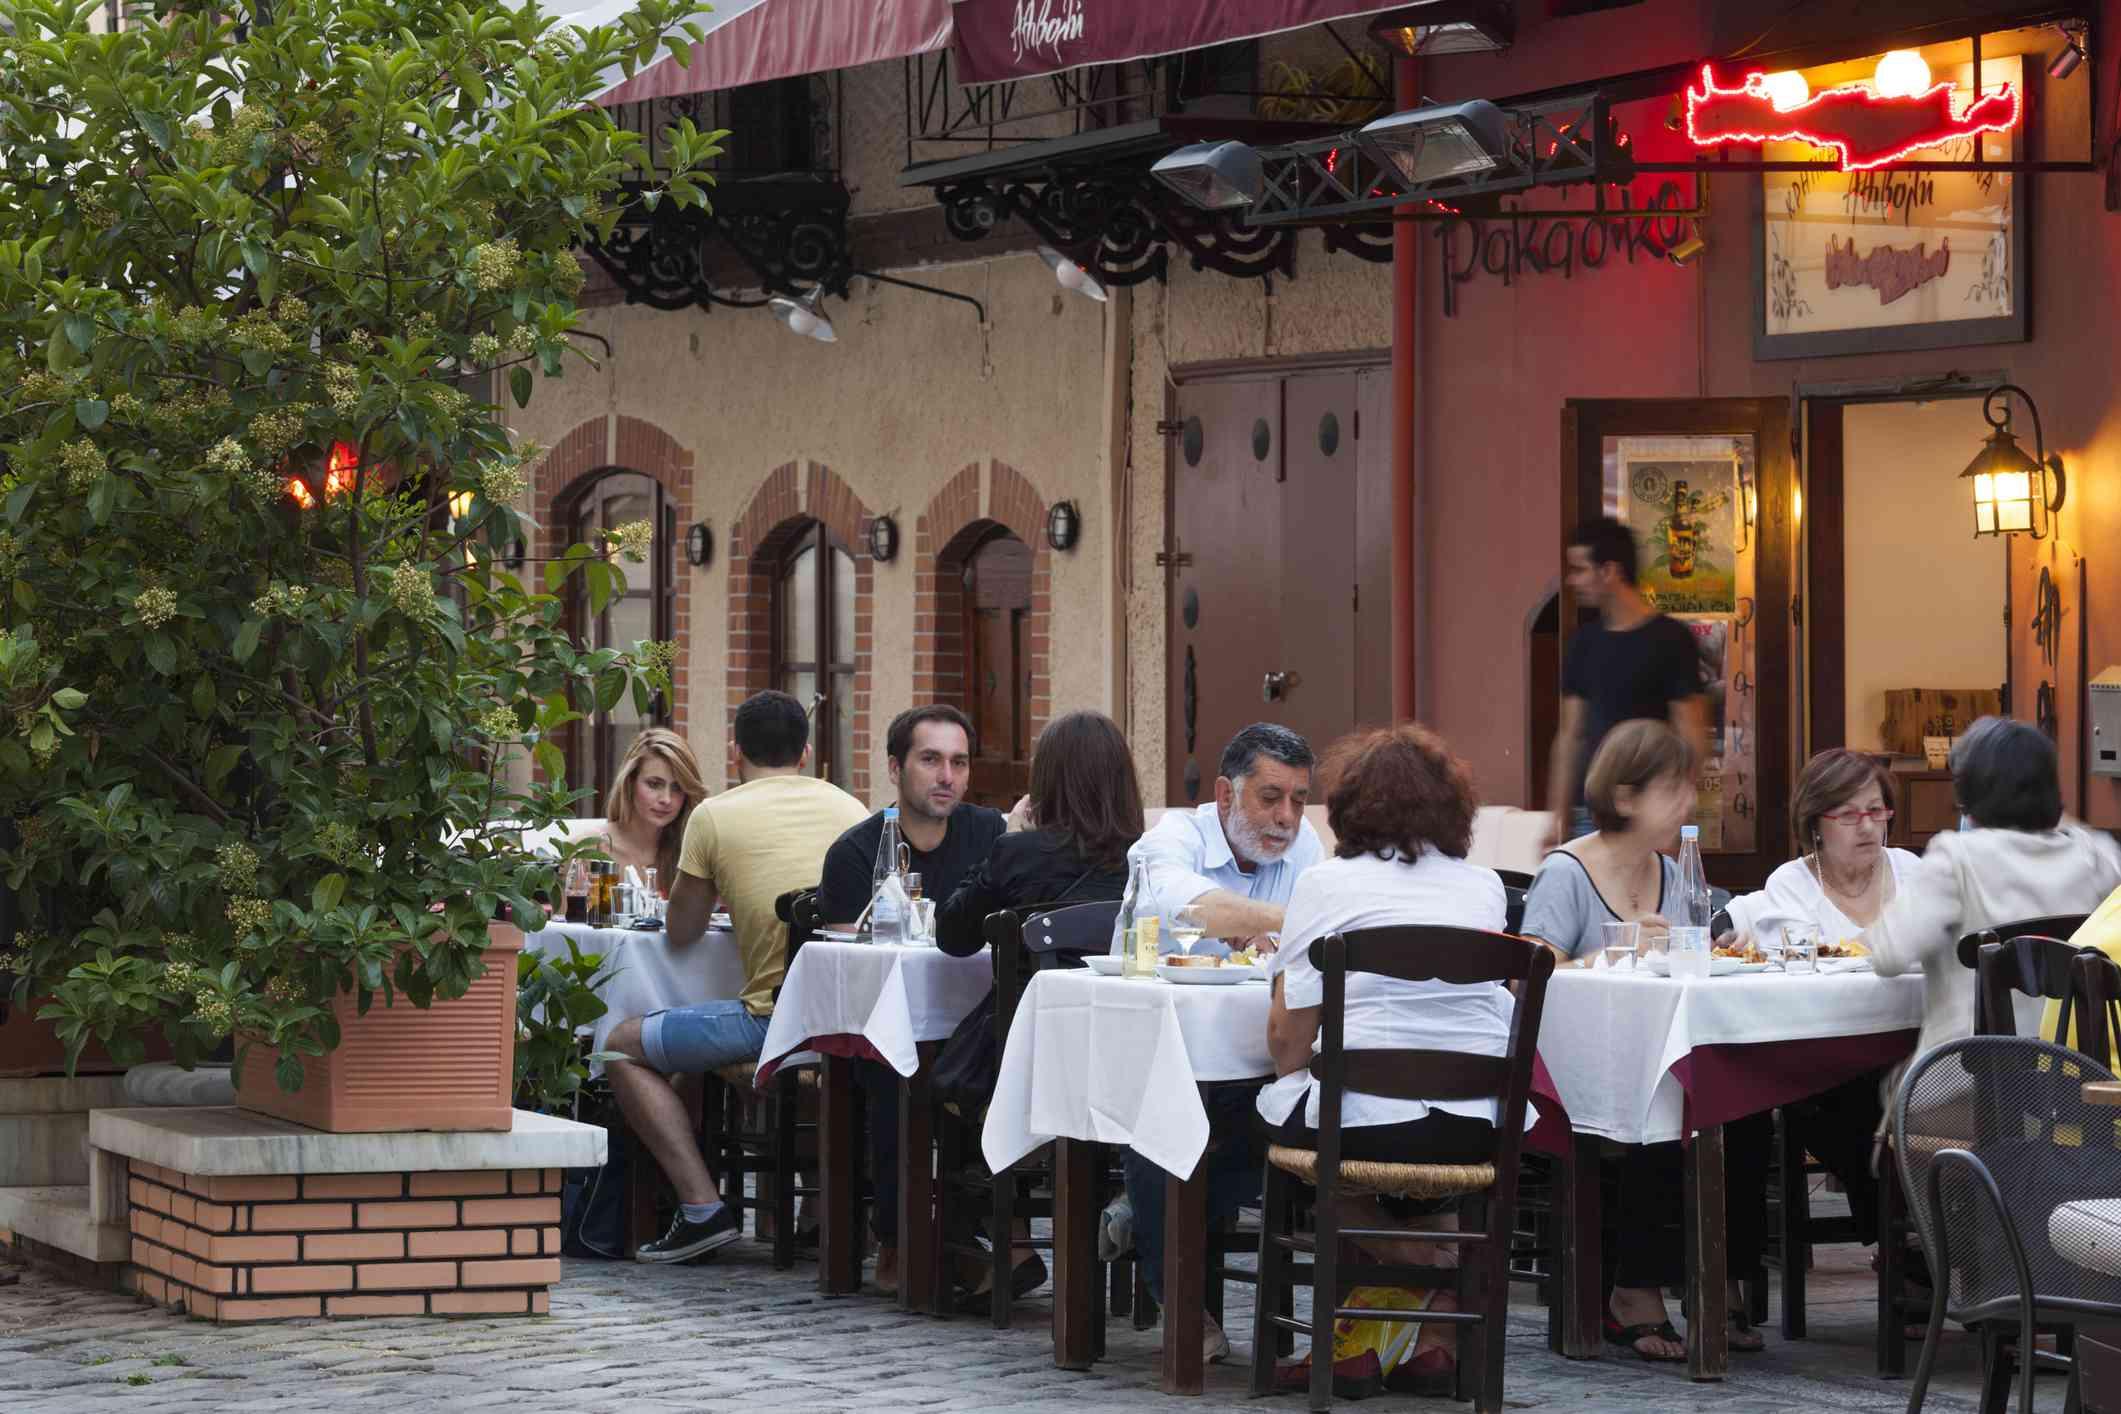 Greece, Central Macedonia Region, Thessaloniki, Ladadika Restaurant District, open air cafe